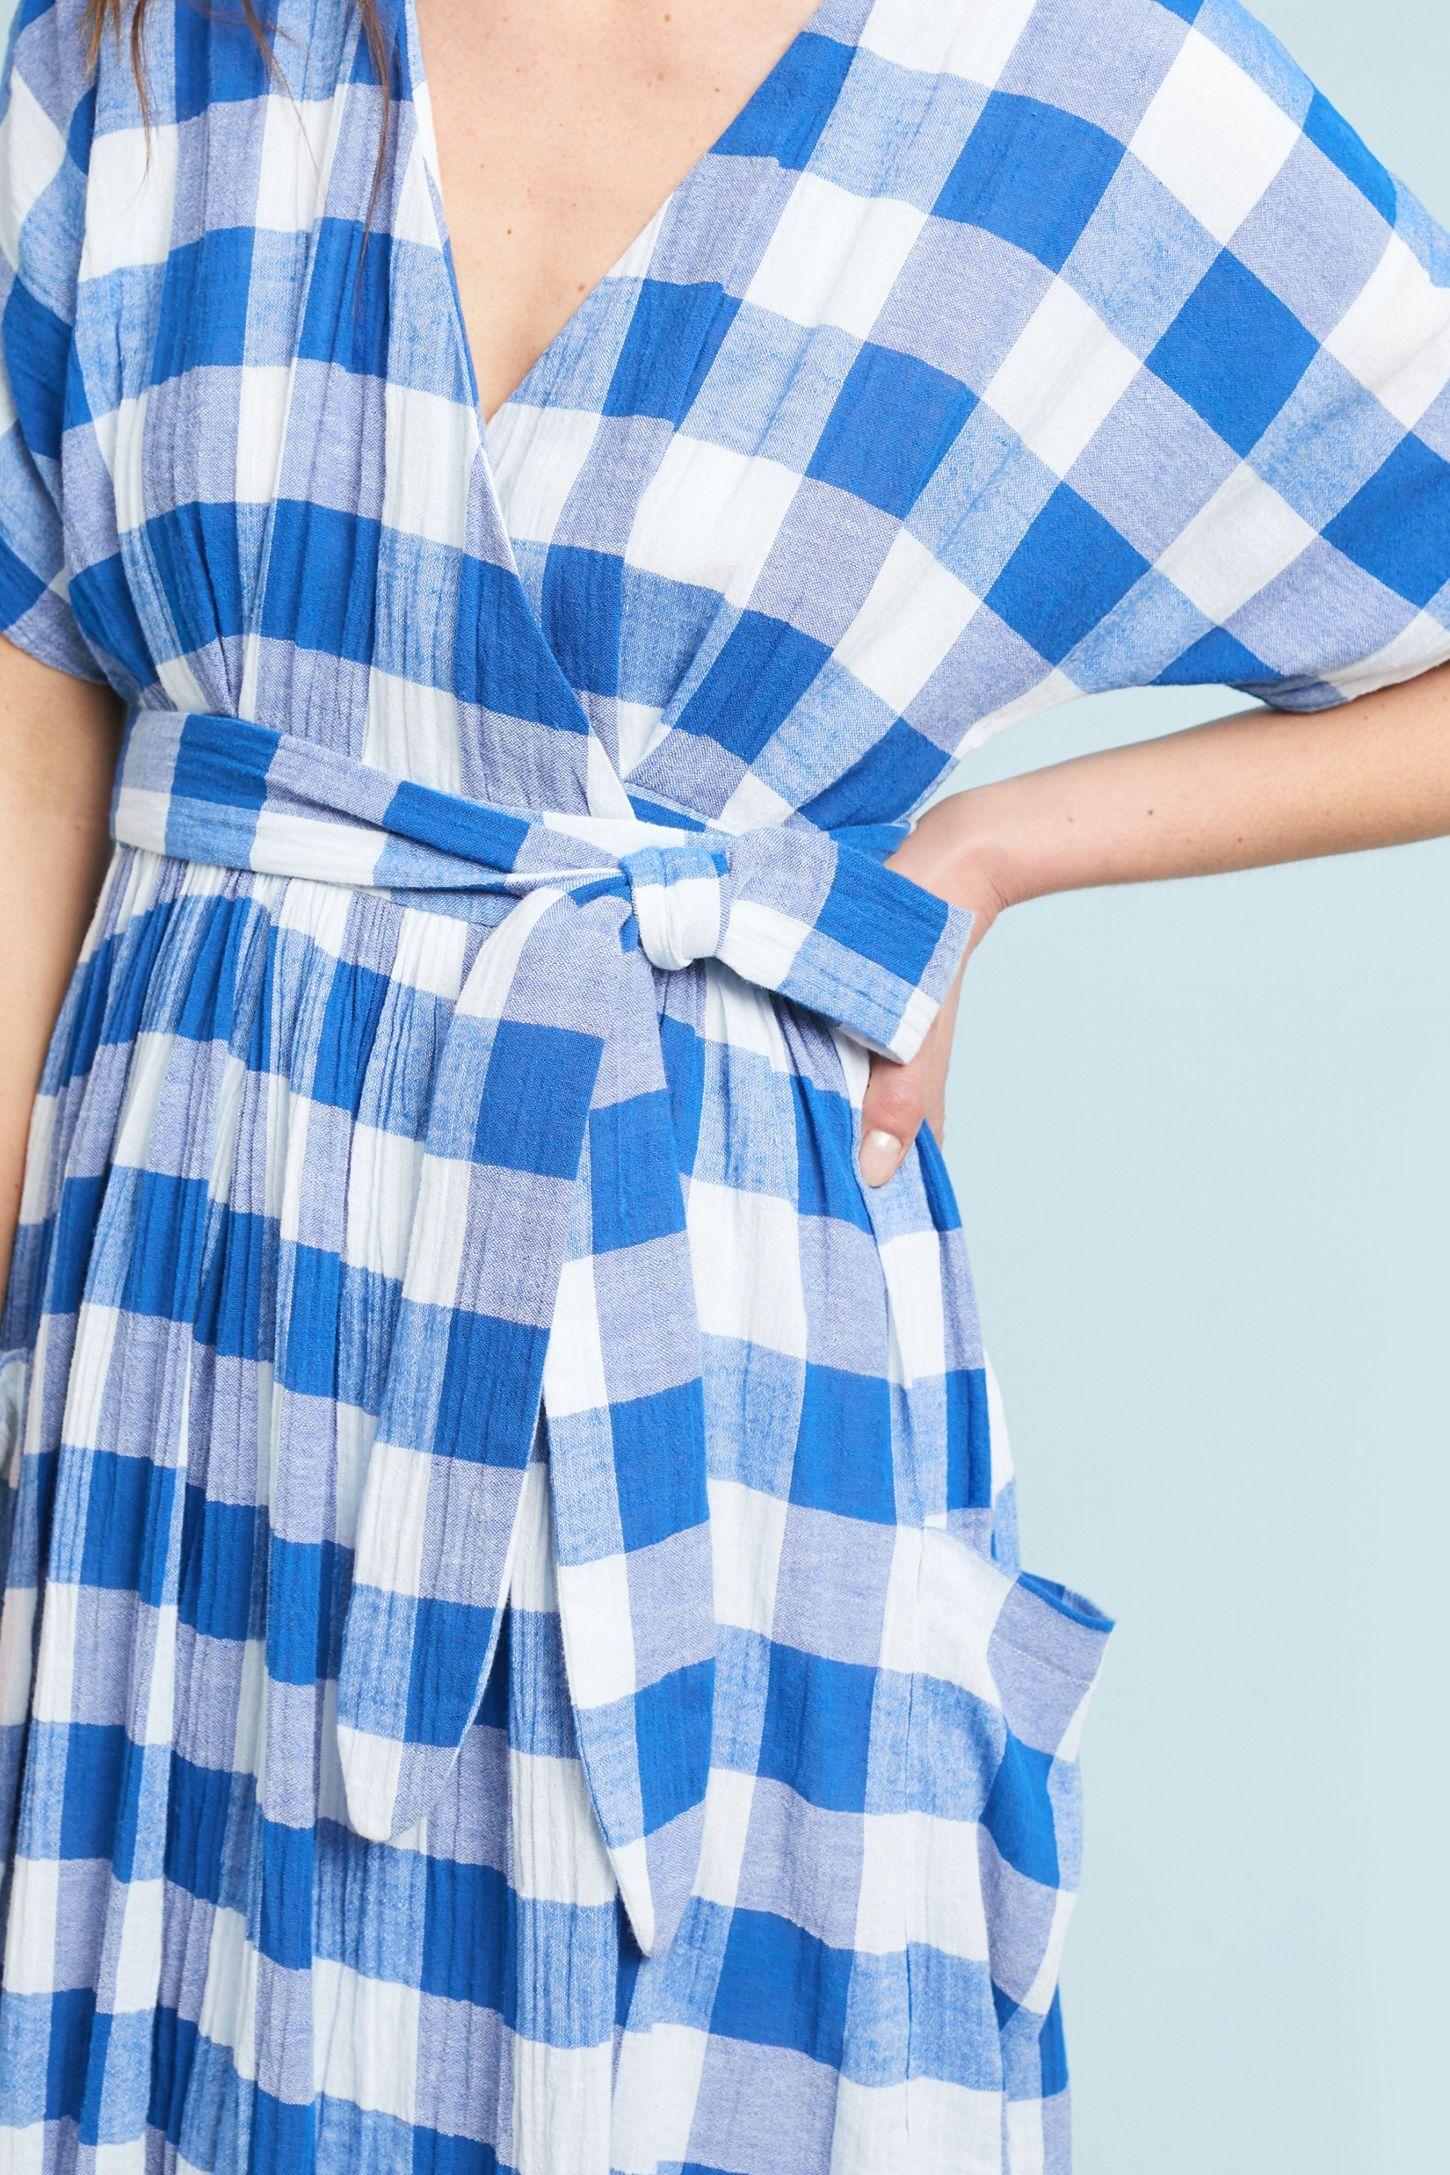 4be632f6b8ca Mara Hoffman Ingrid Gingham Dress | Lookbook | Pinterest | Mara ...